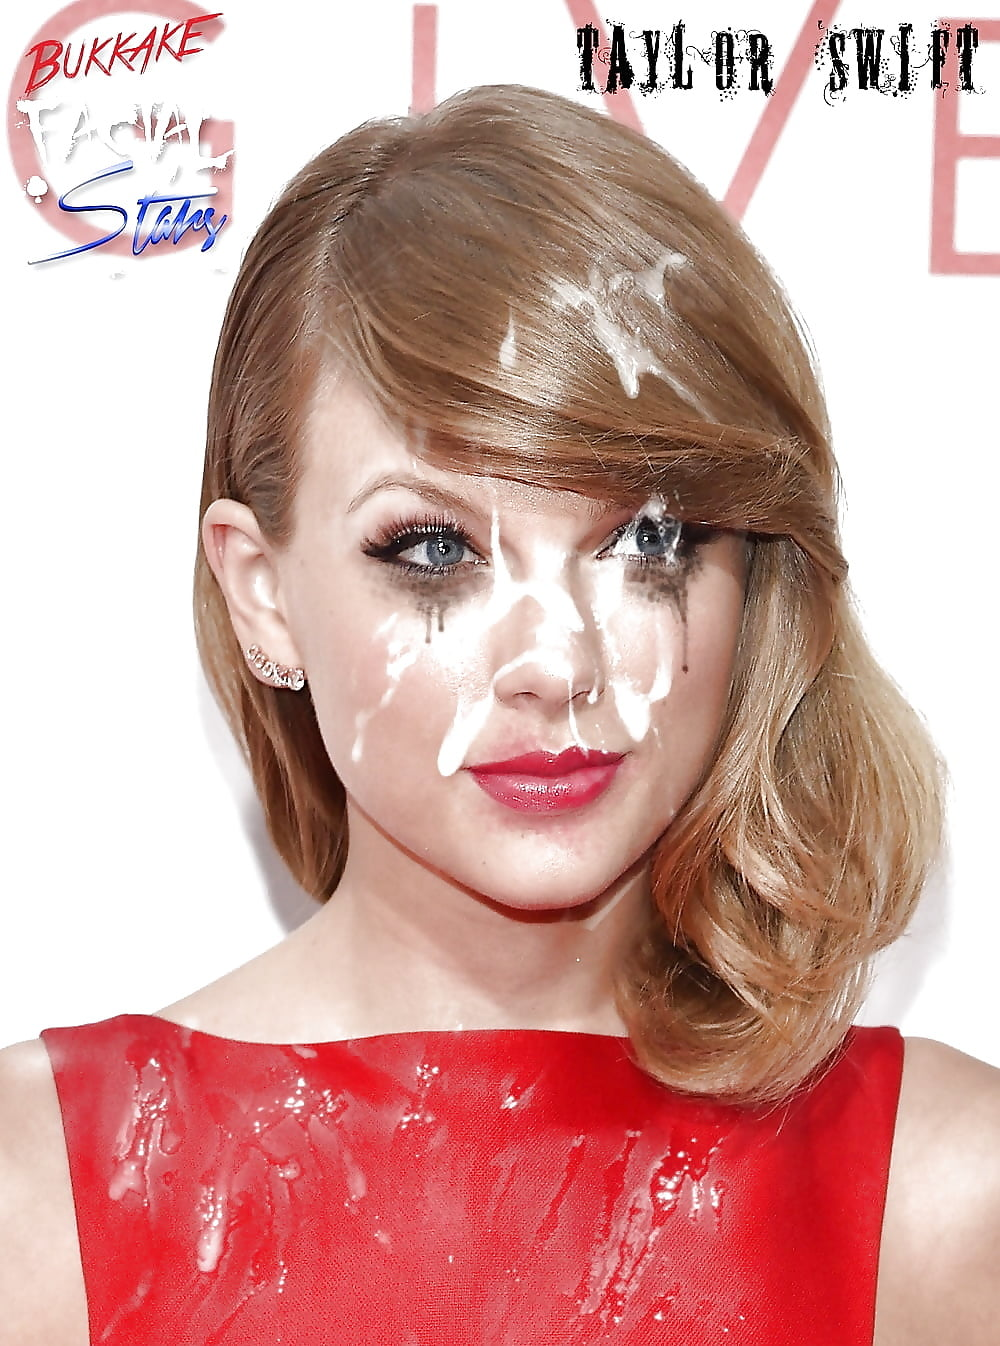 Taylor Swift Fakes - 431 Pics | xHamster